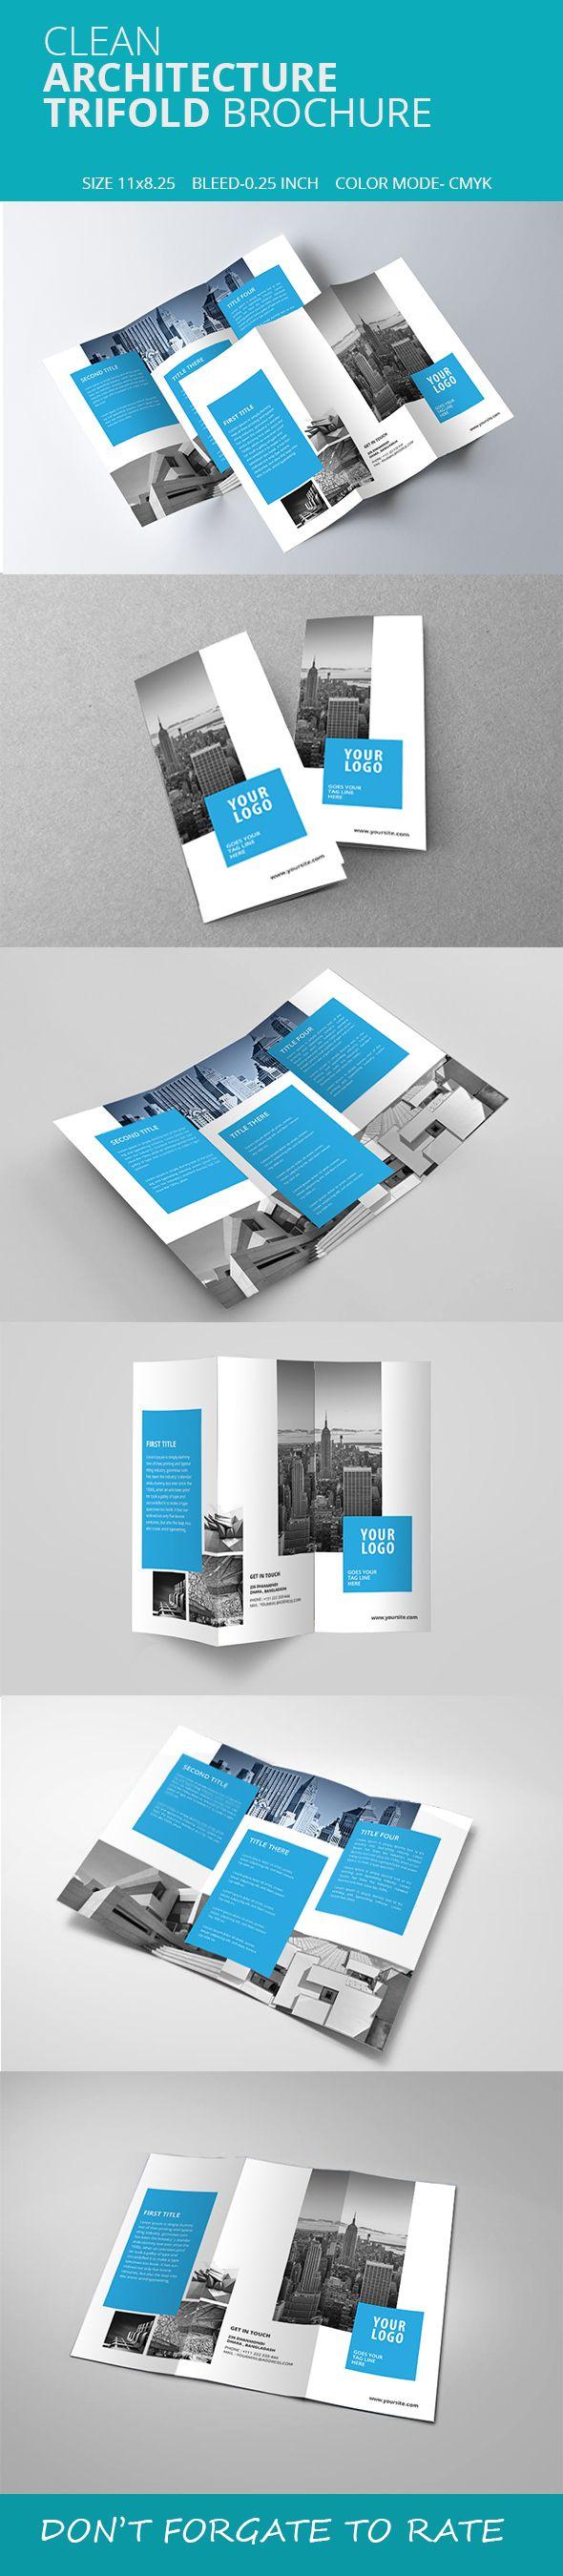 Clean Architecture Trifold Brochure on Behance   Portfolio ideas ...